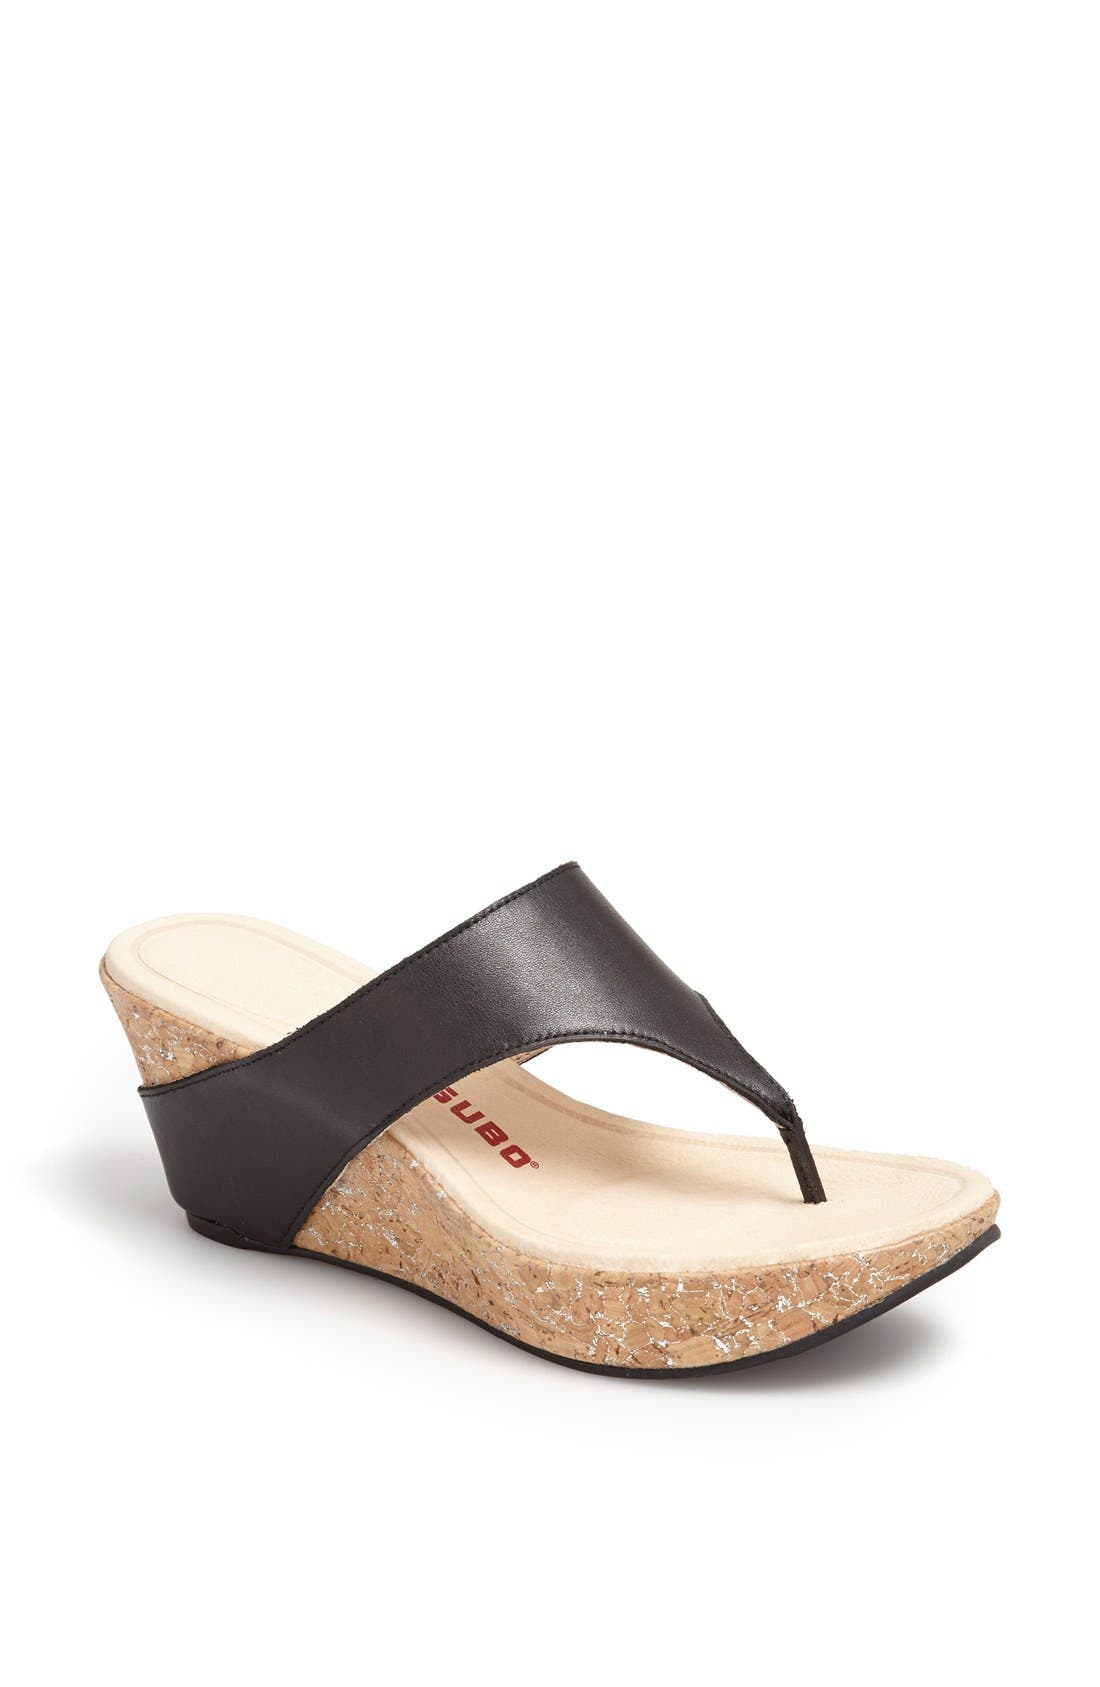 Alternate Image 1 Selected - Tsubo 'Odelle' Wedge Thong Sandal